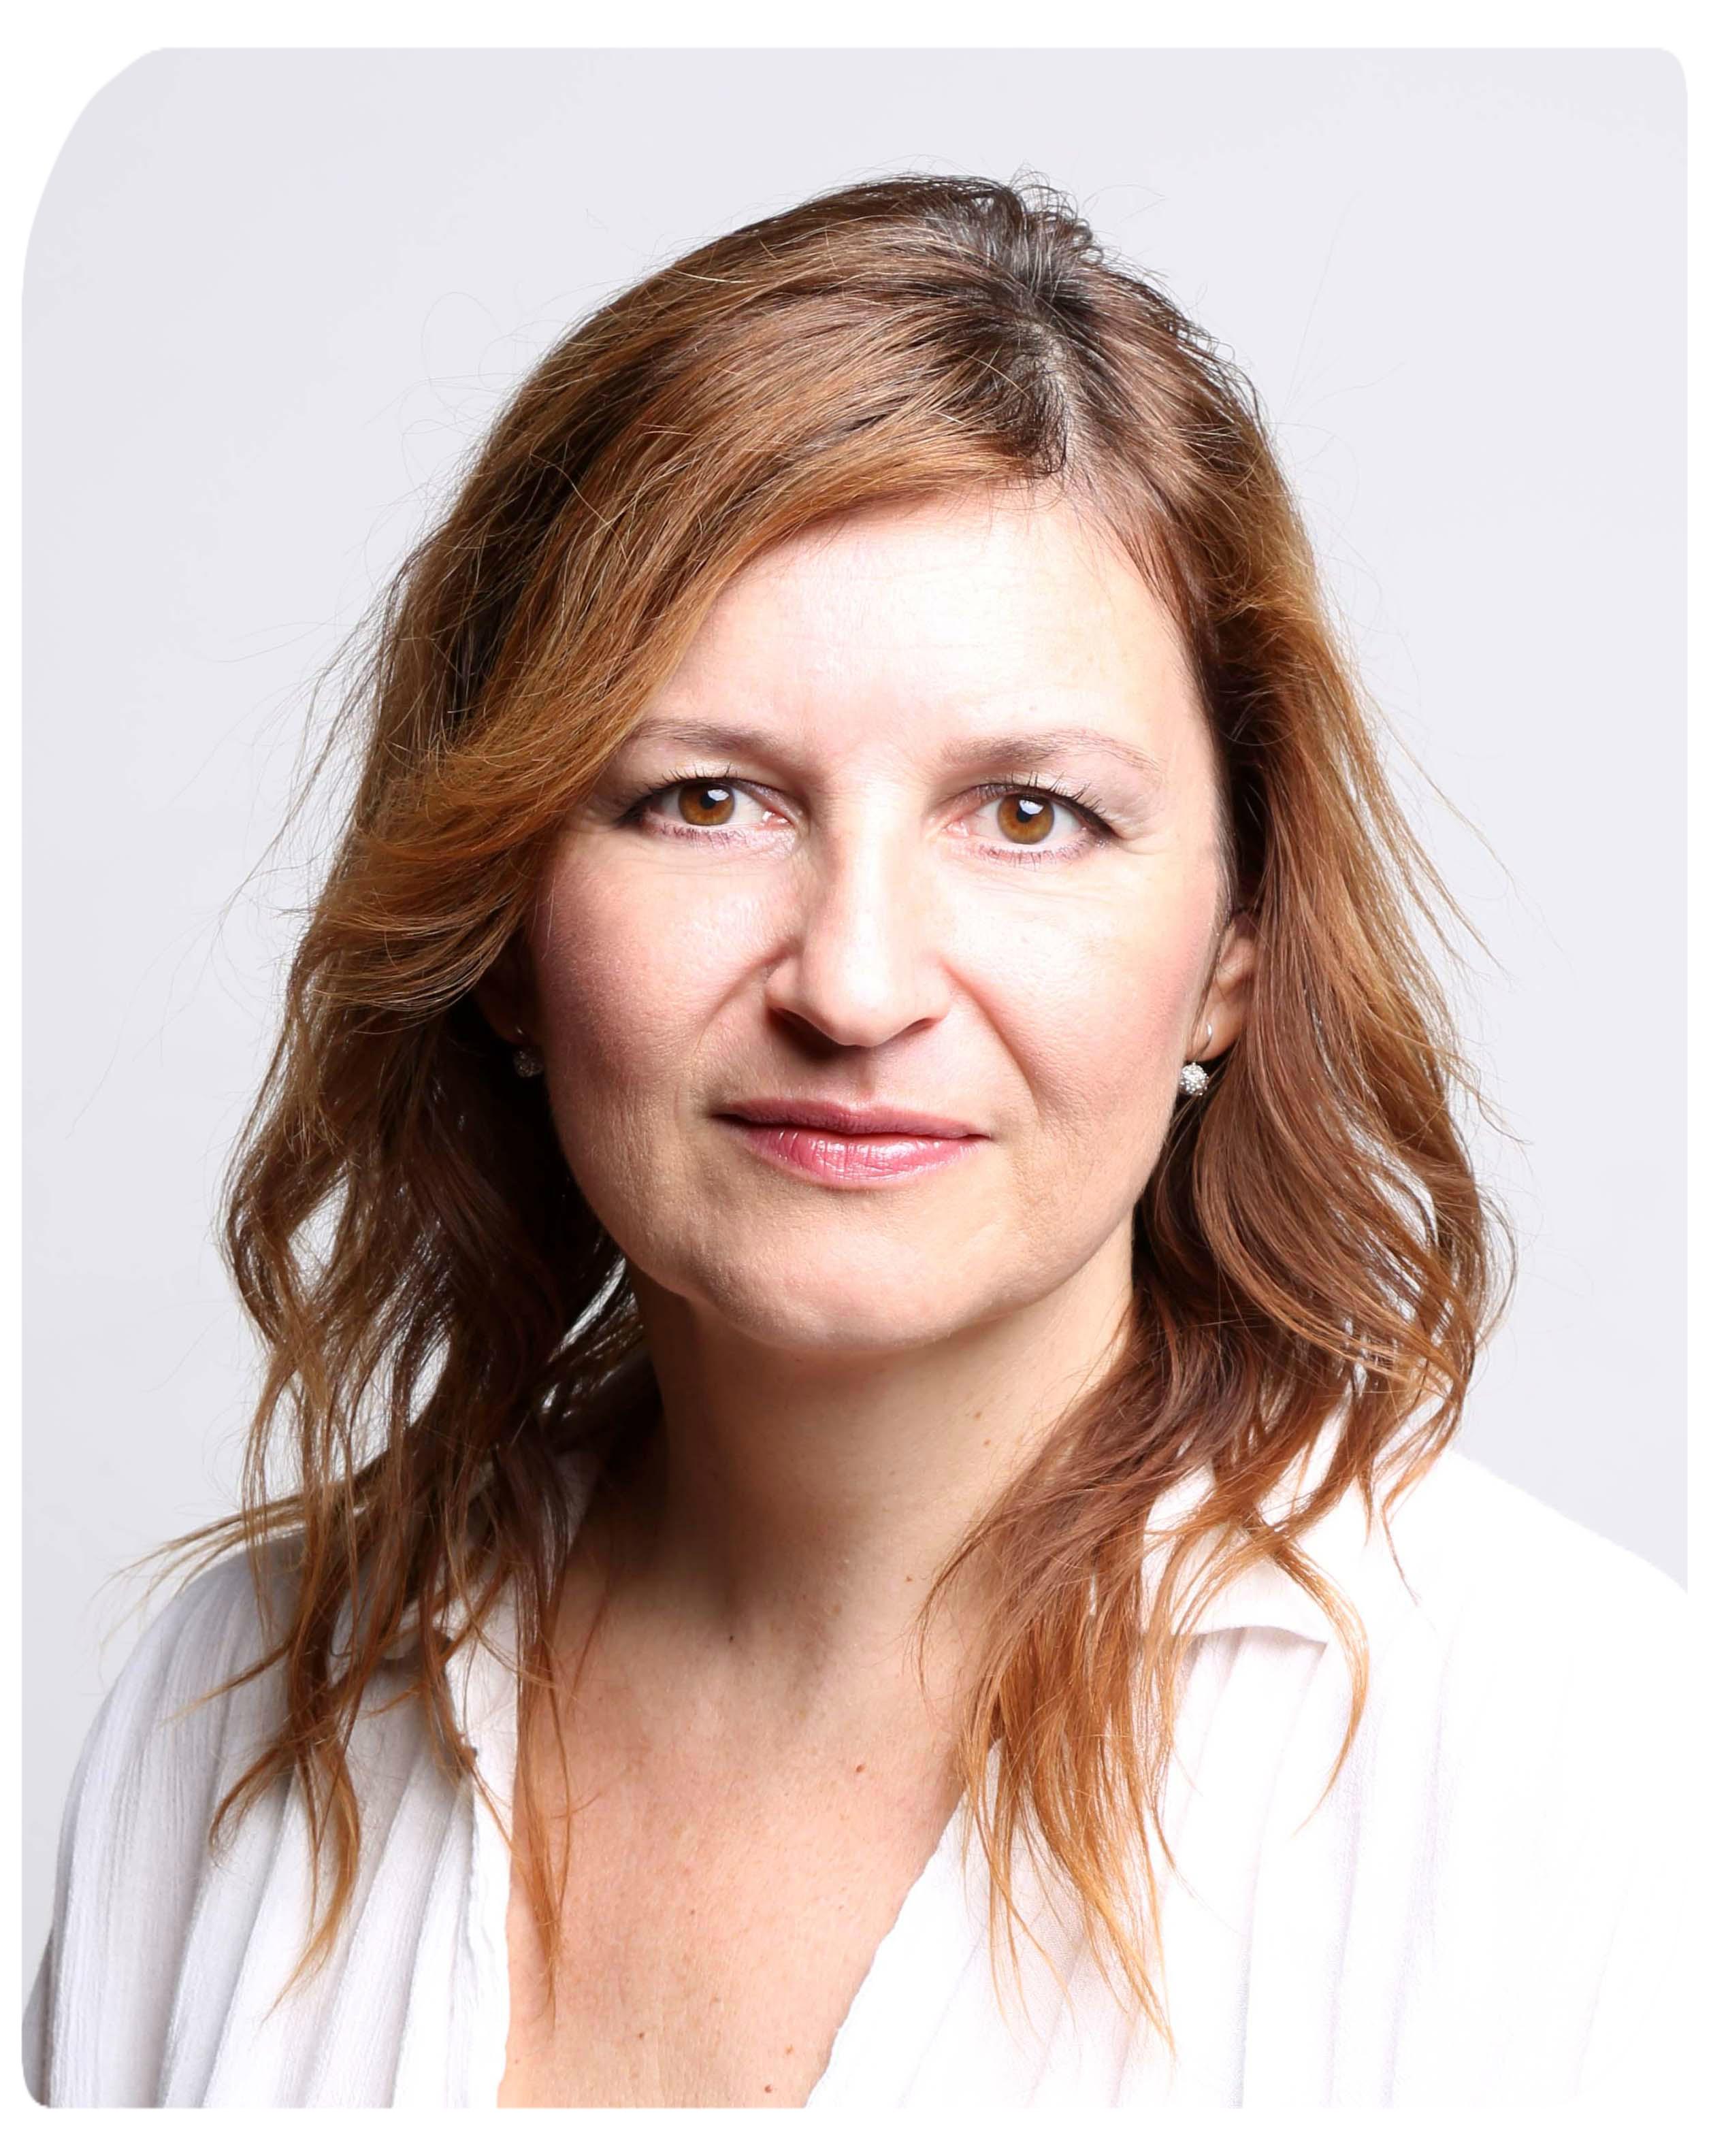 Marcela Choudhury